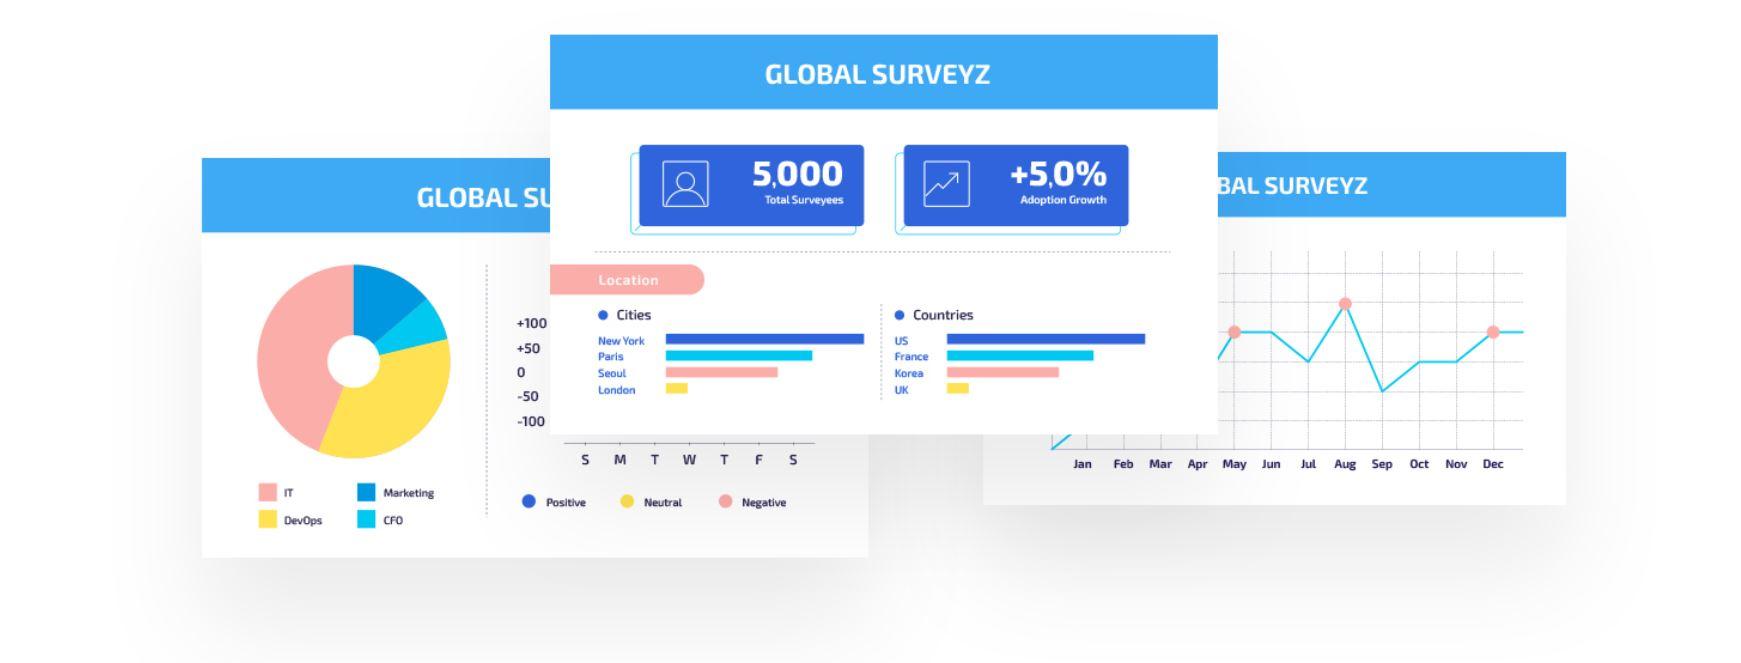 Sample B2B Survey Results Thumbnails